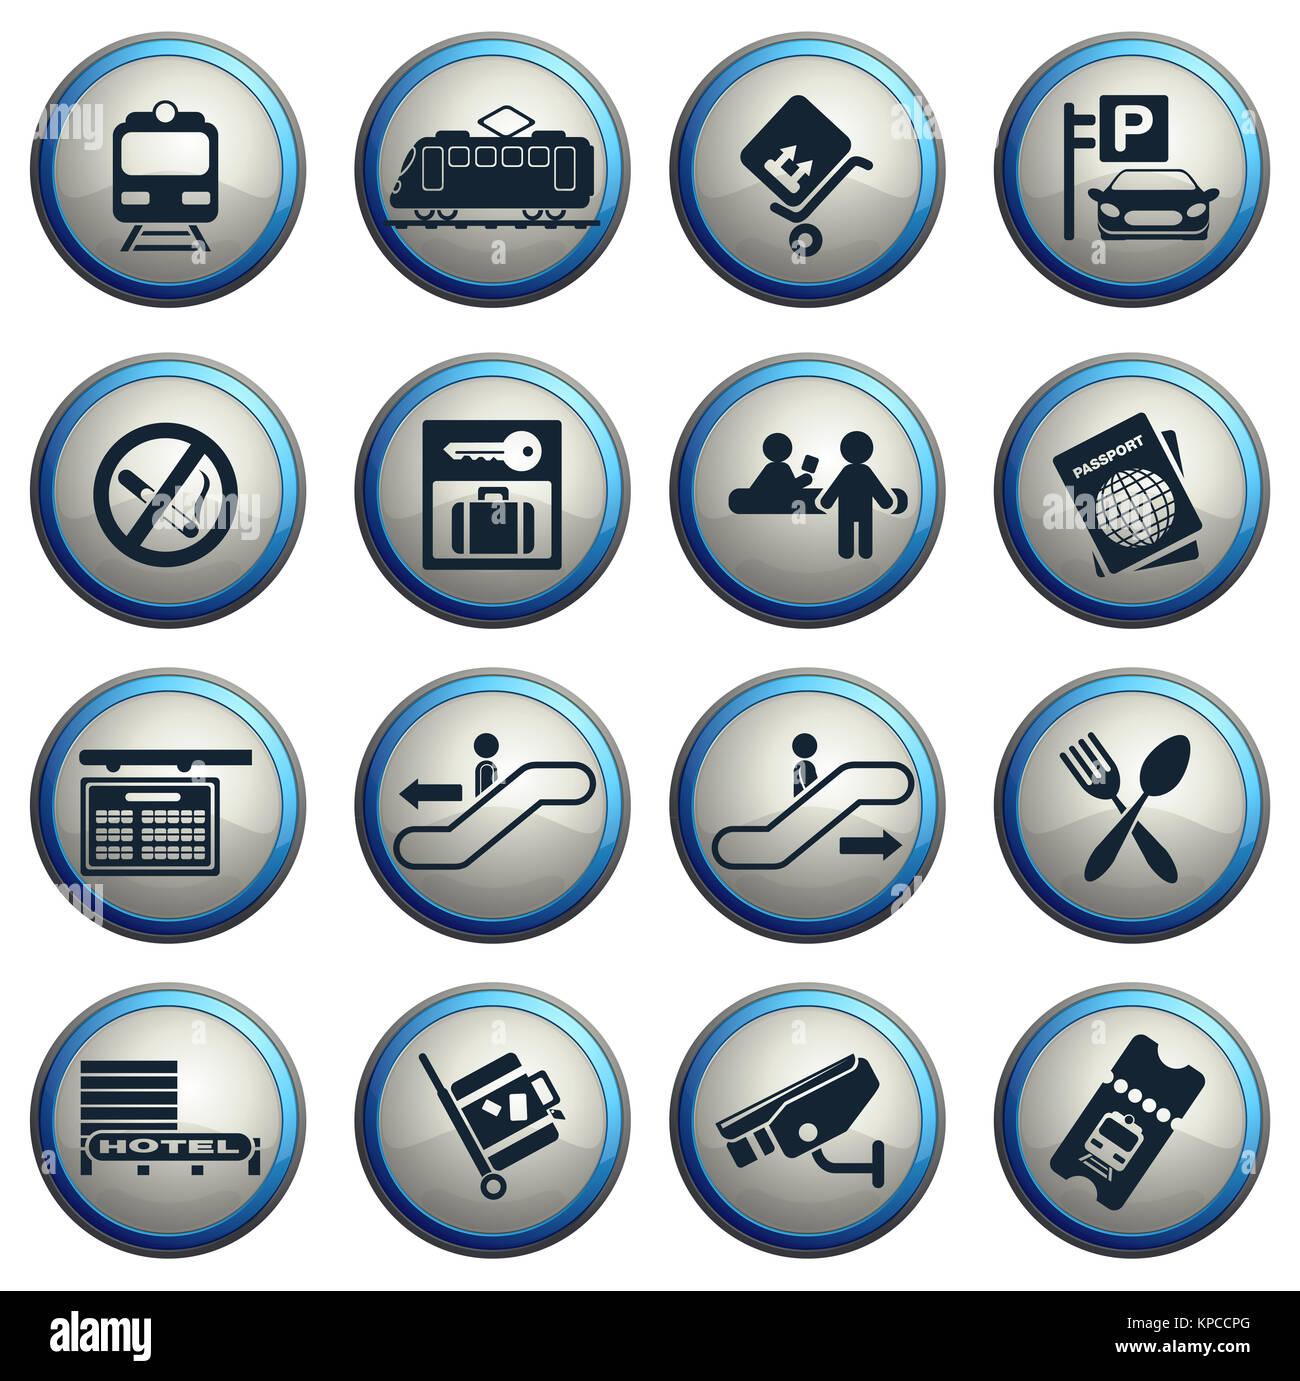 Train Station Symbols Stock Photo 168689208 Alamy